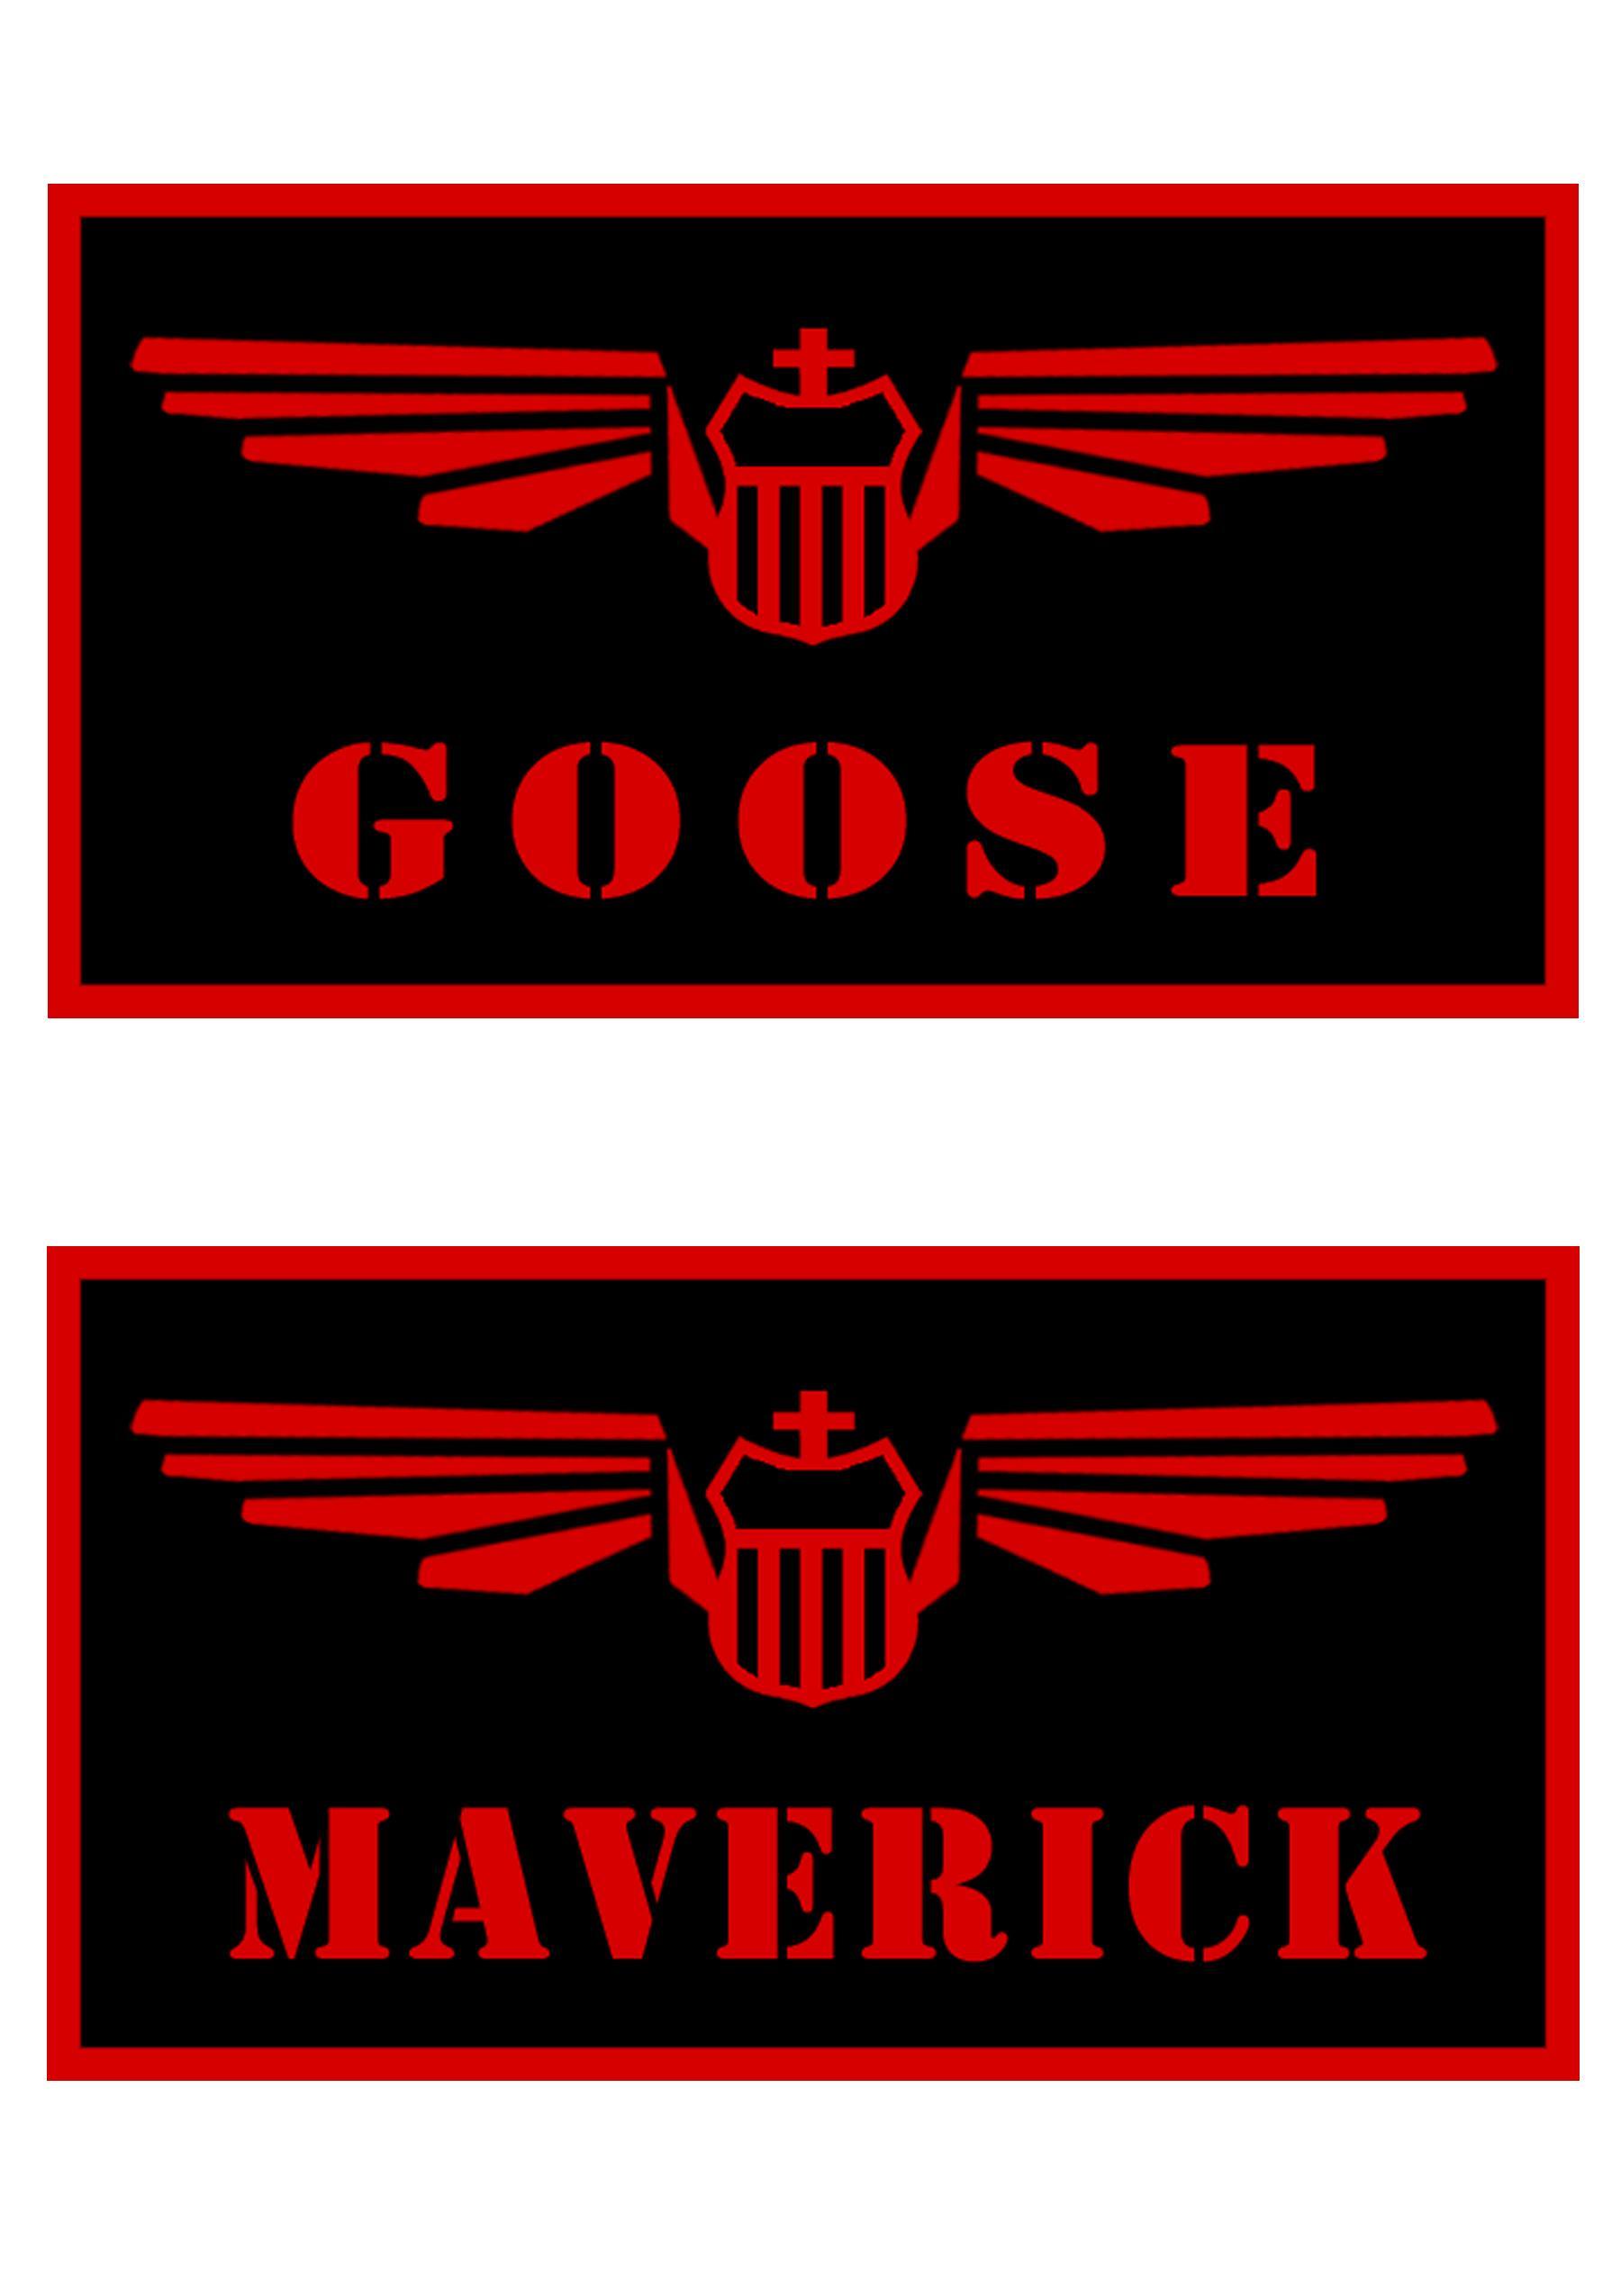 top gun maverick badge hot girls wallpaper